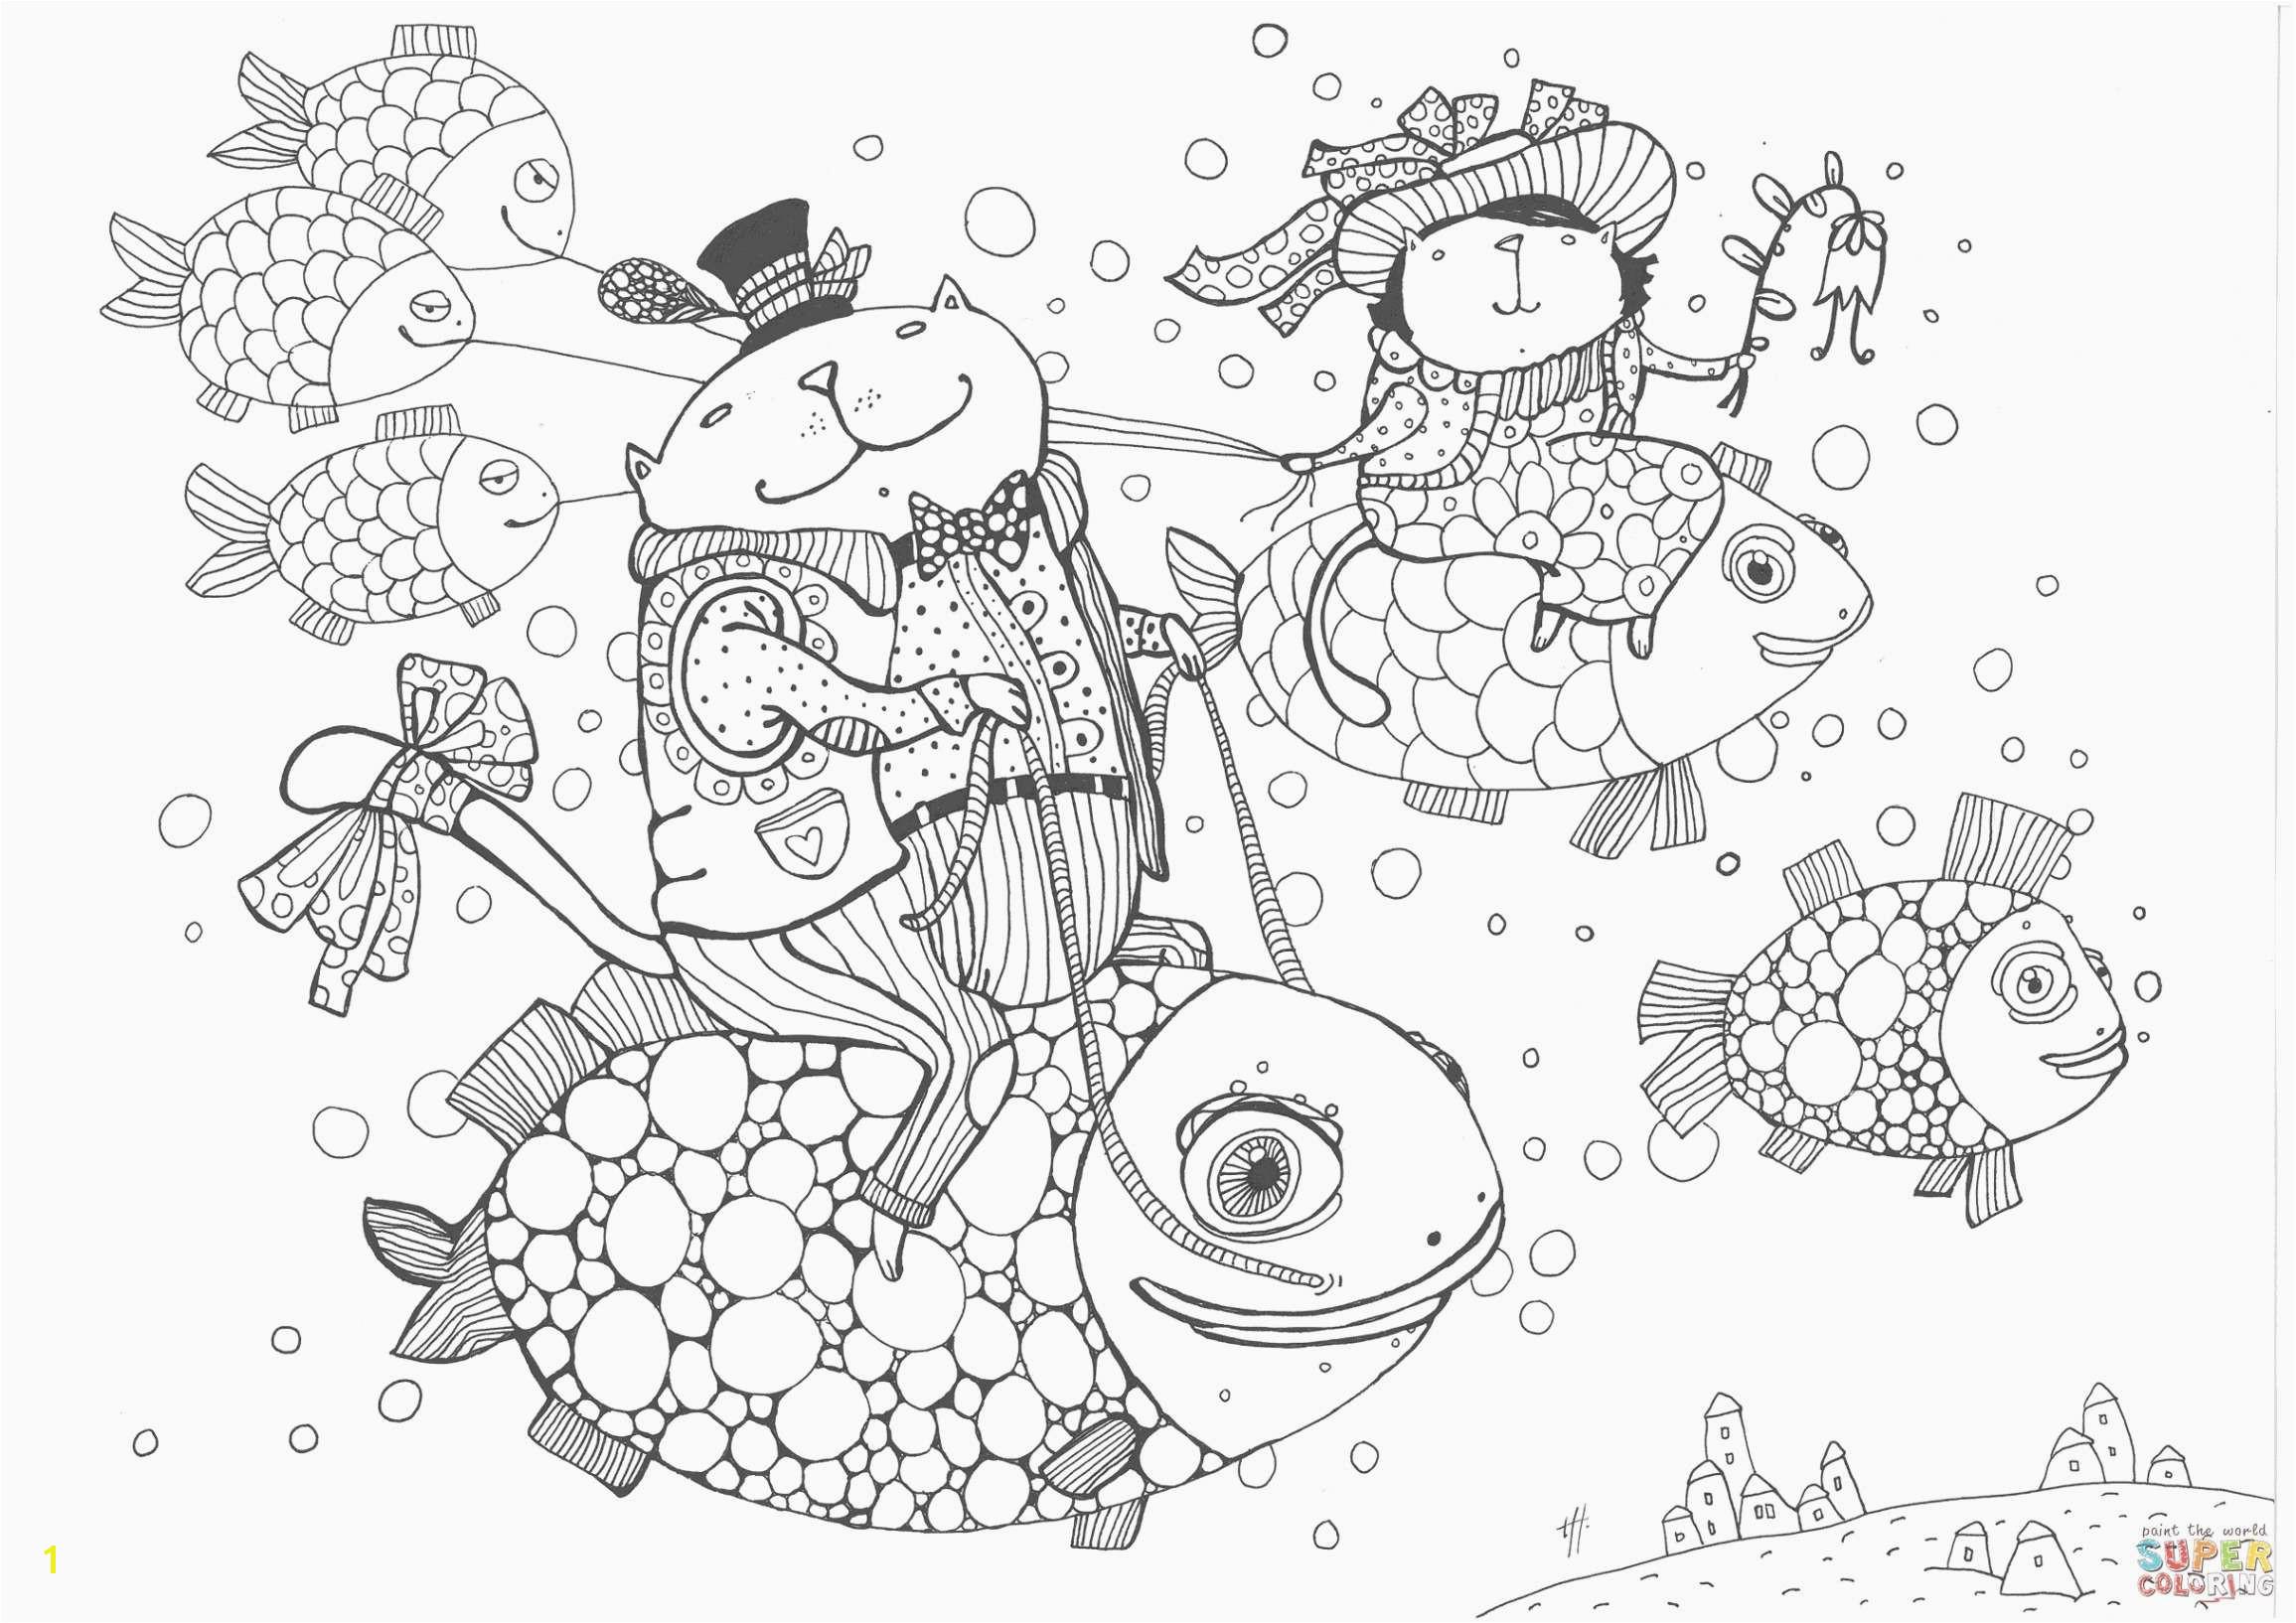 Ausmalbilder Mario Rosalina Schön Daisy From Mario Coloring Pages Princess Daisy Coloring Page